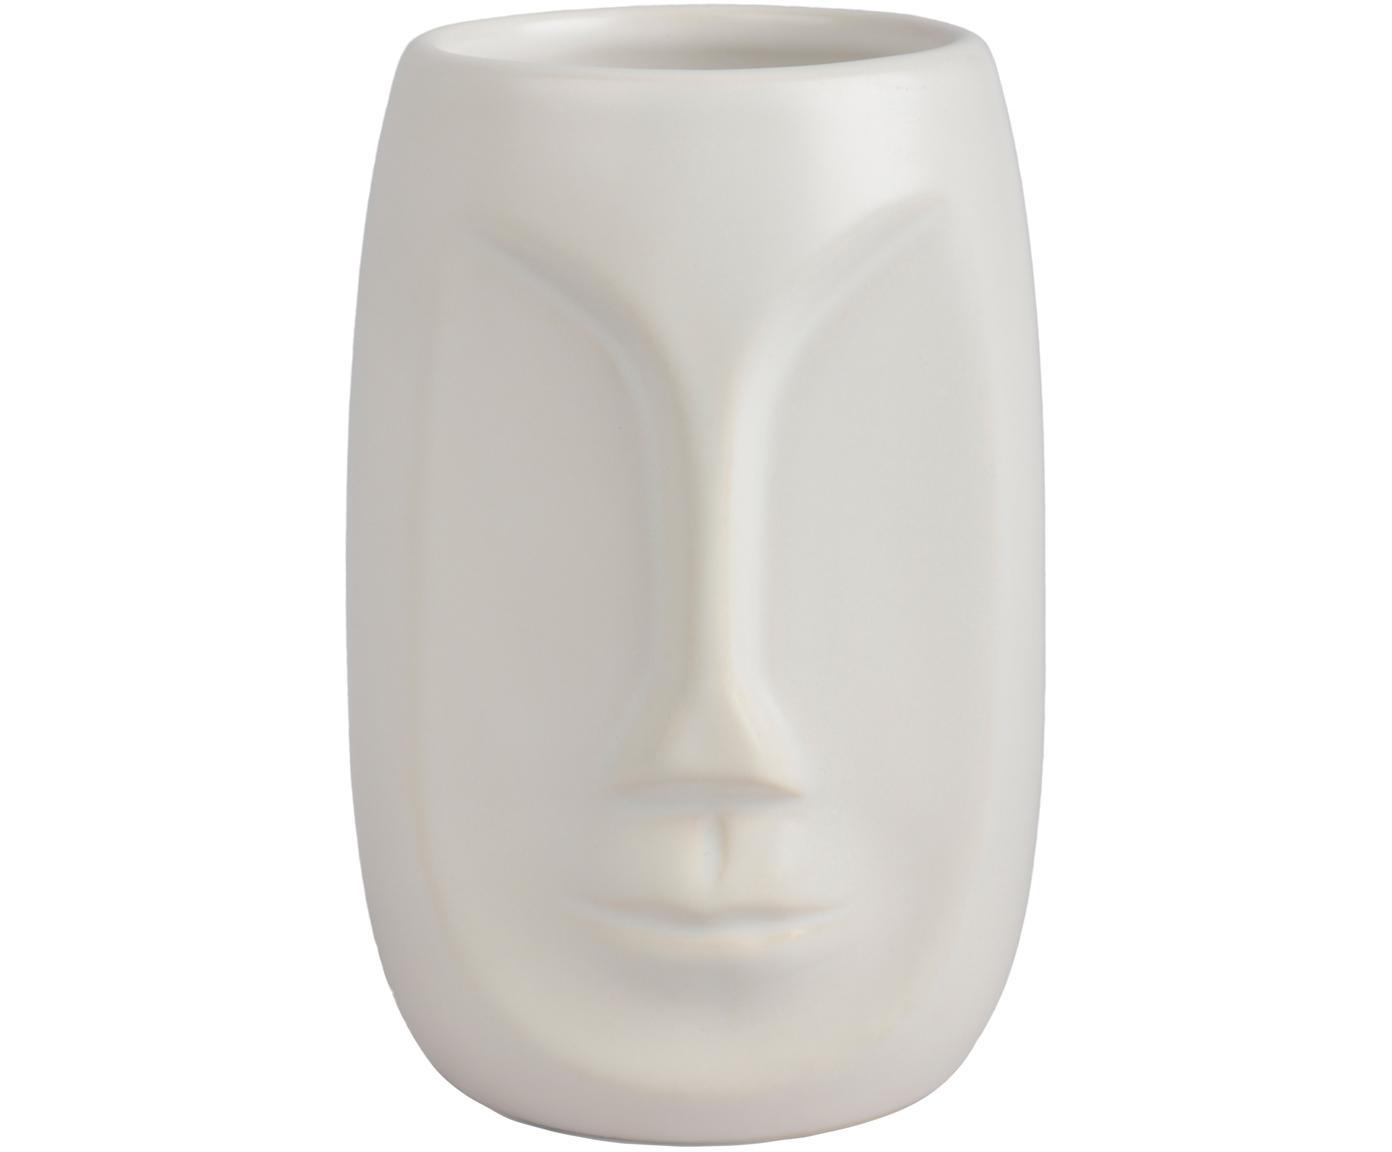 Porta spazzolini Urban, Ceramica, Bianco, Ø 7 x Alt. 11 cm